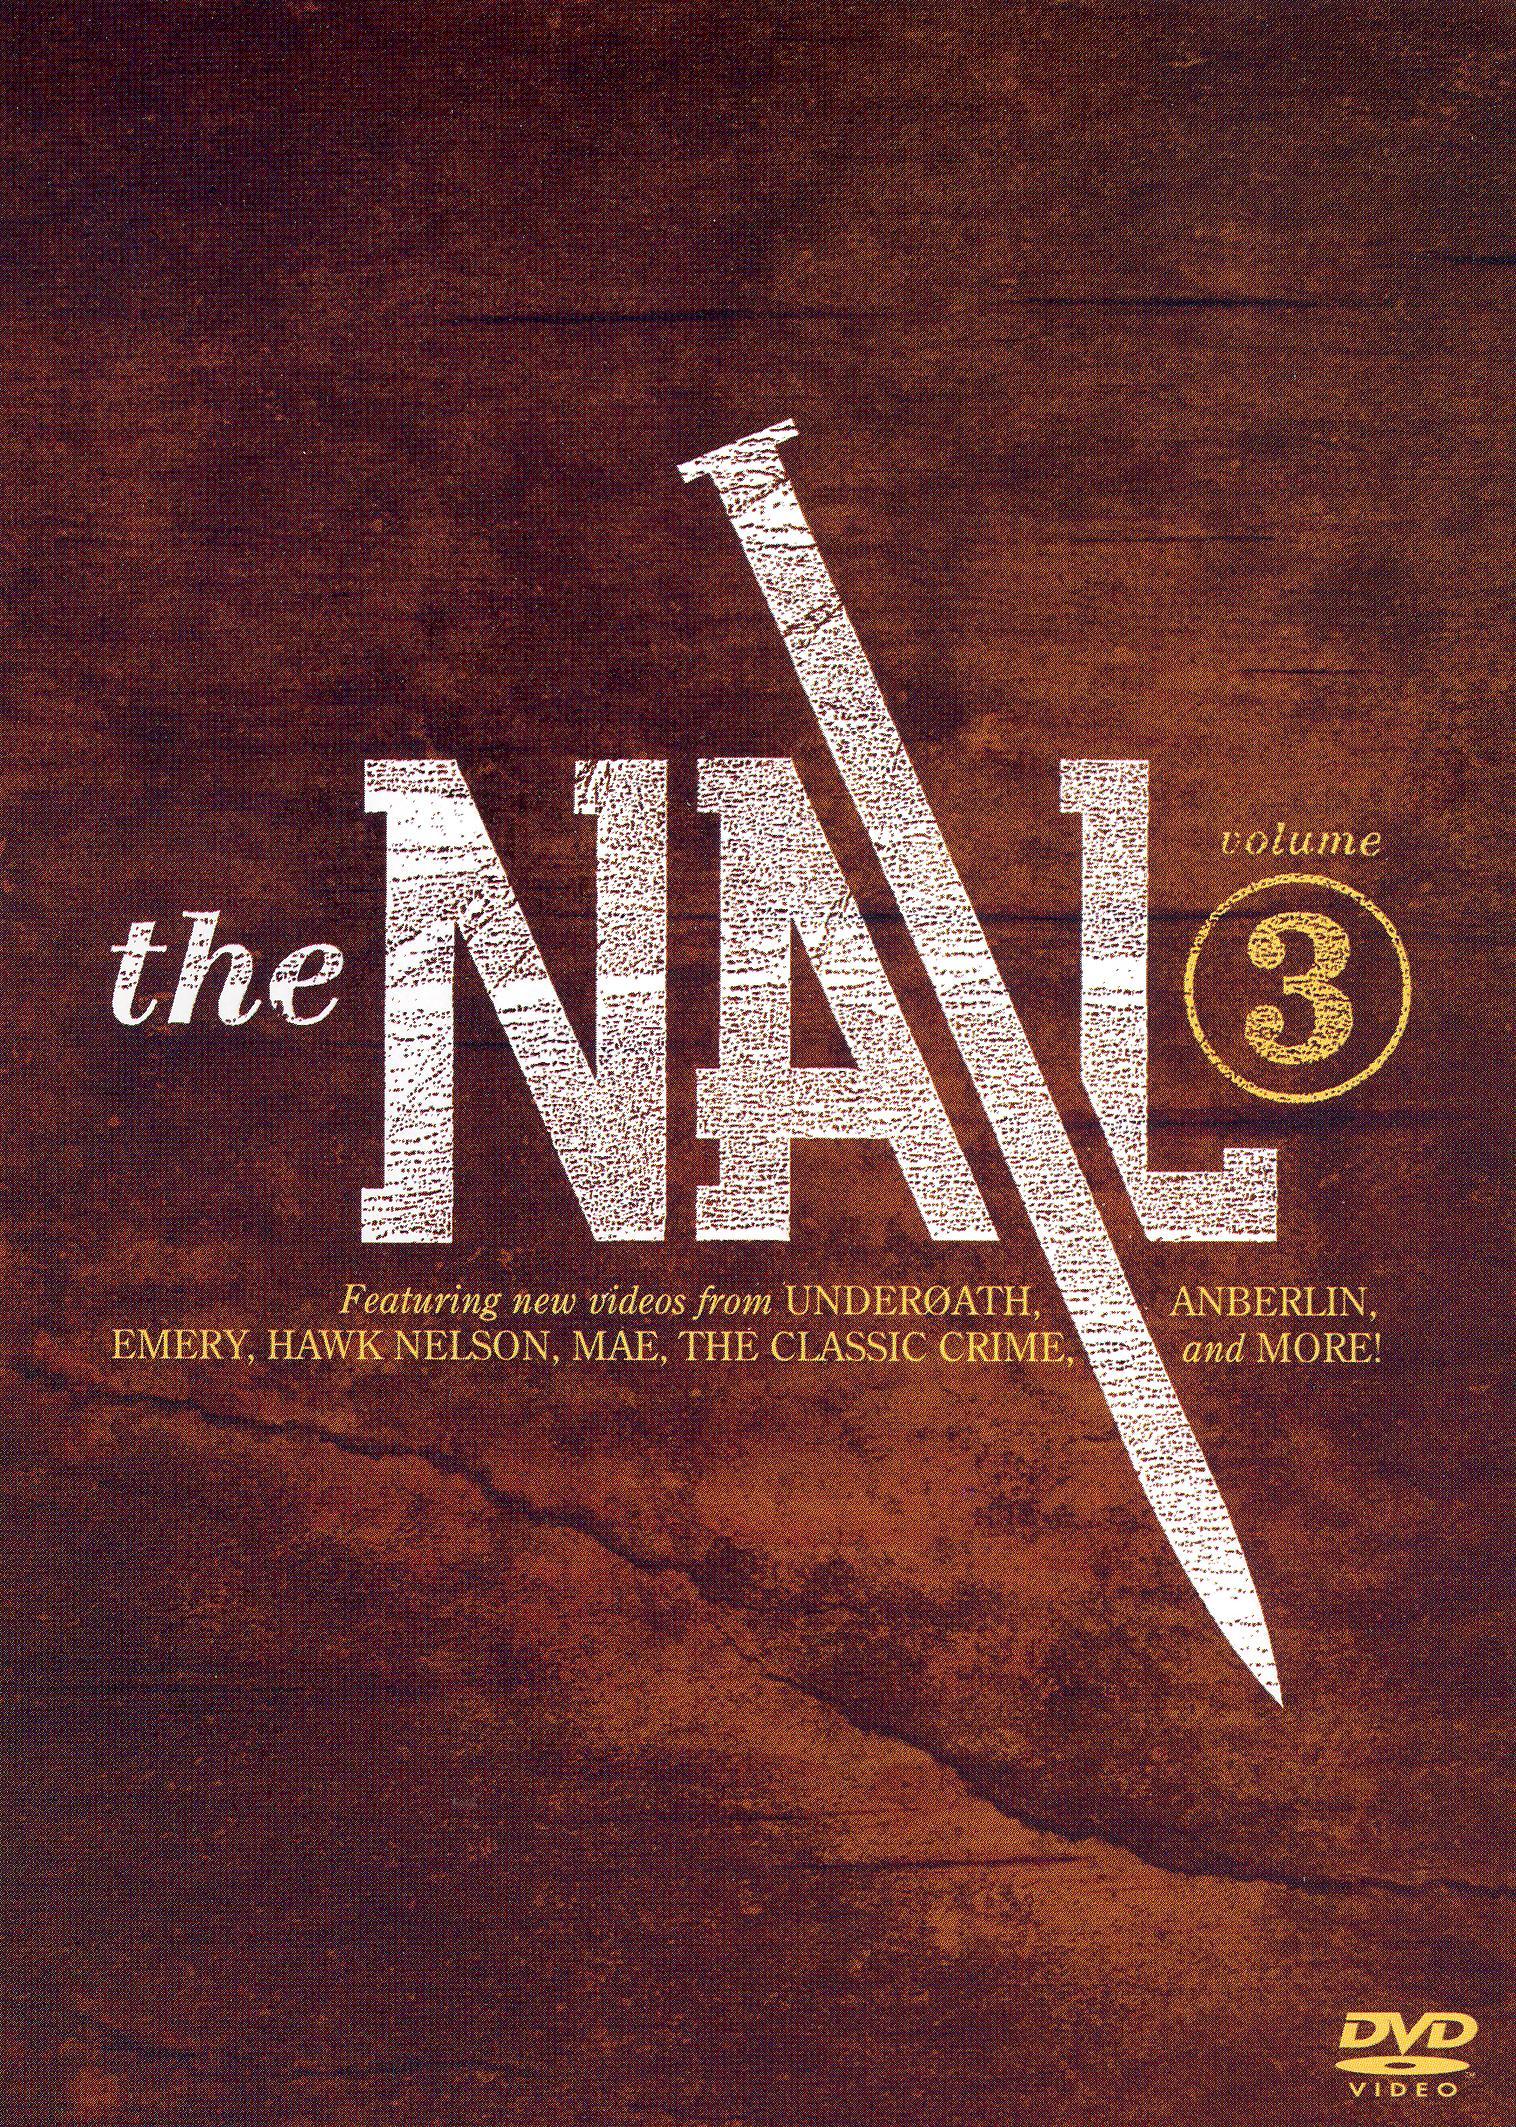 The Nail DVD: Tooth & Nail Video, Vol. 3